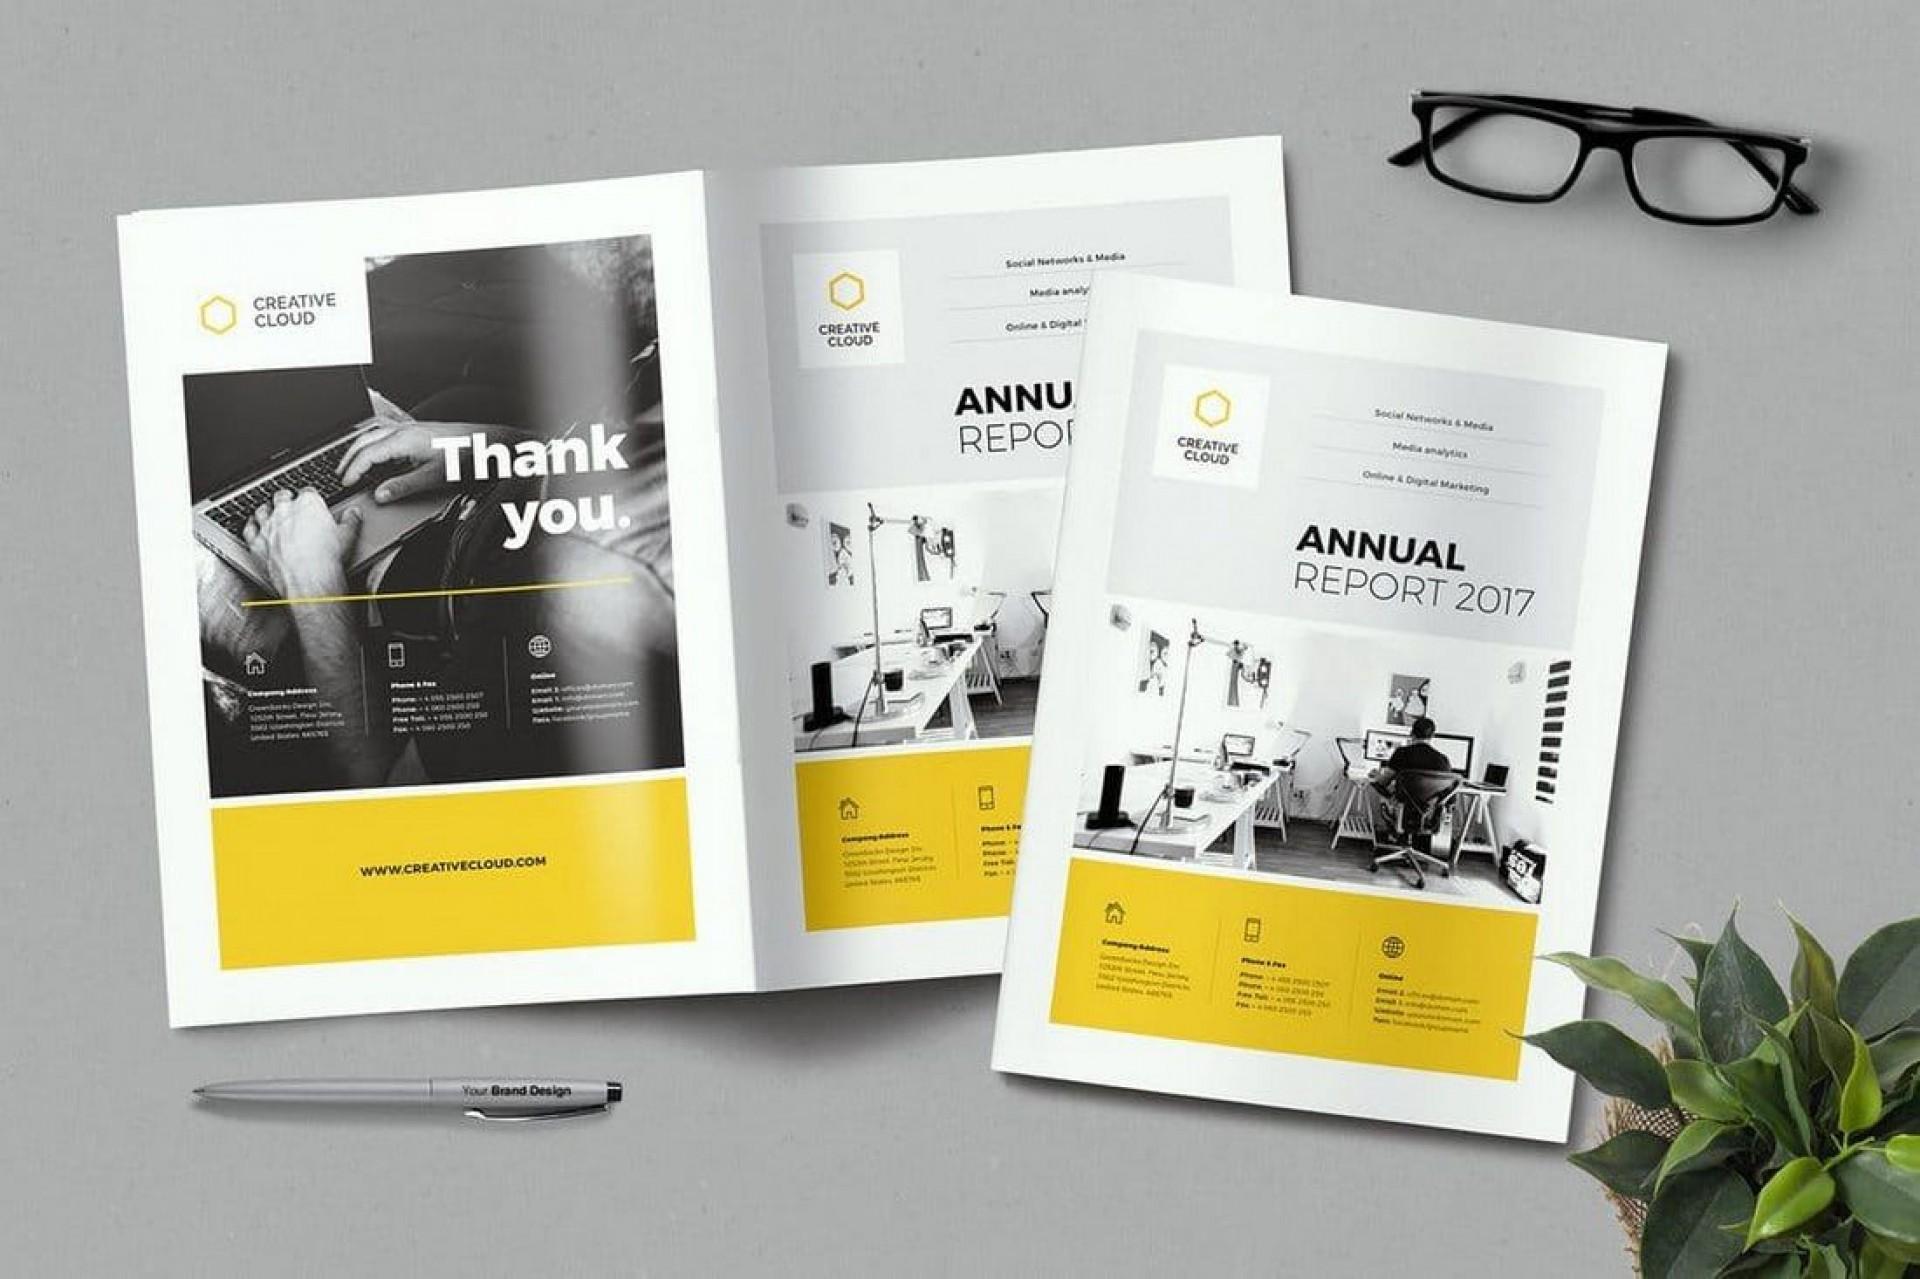 007 Unforgettable Free Annual Report Template Indesign Picture  Adobe Non Profit1920